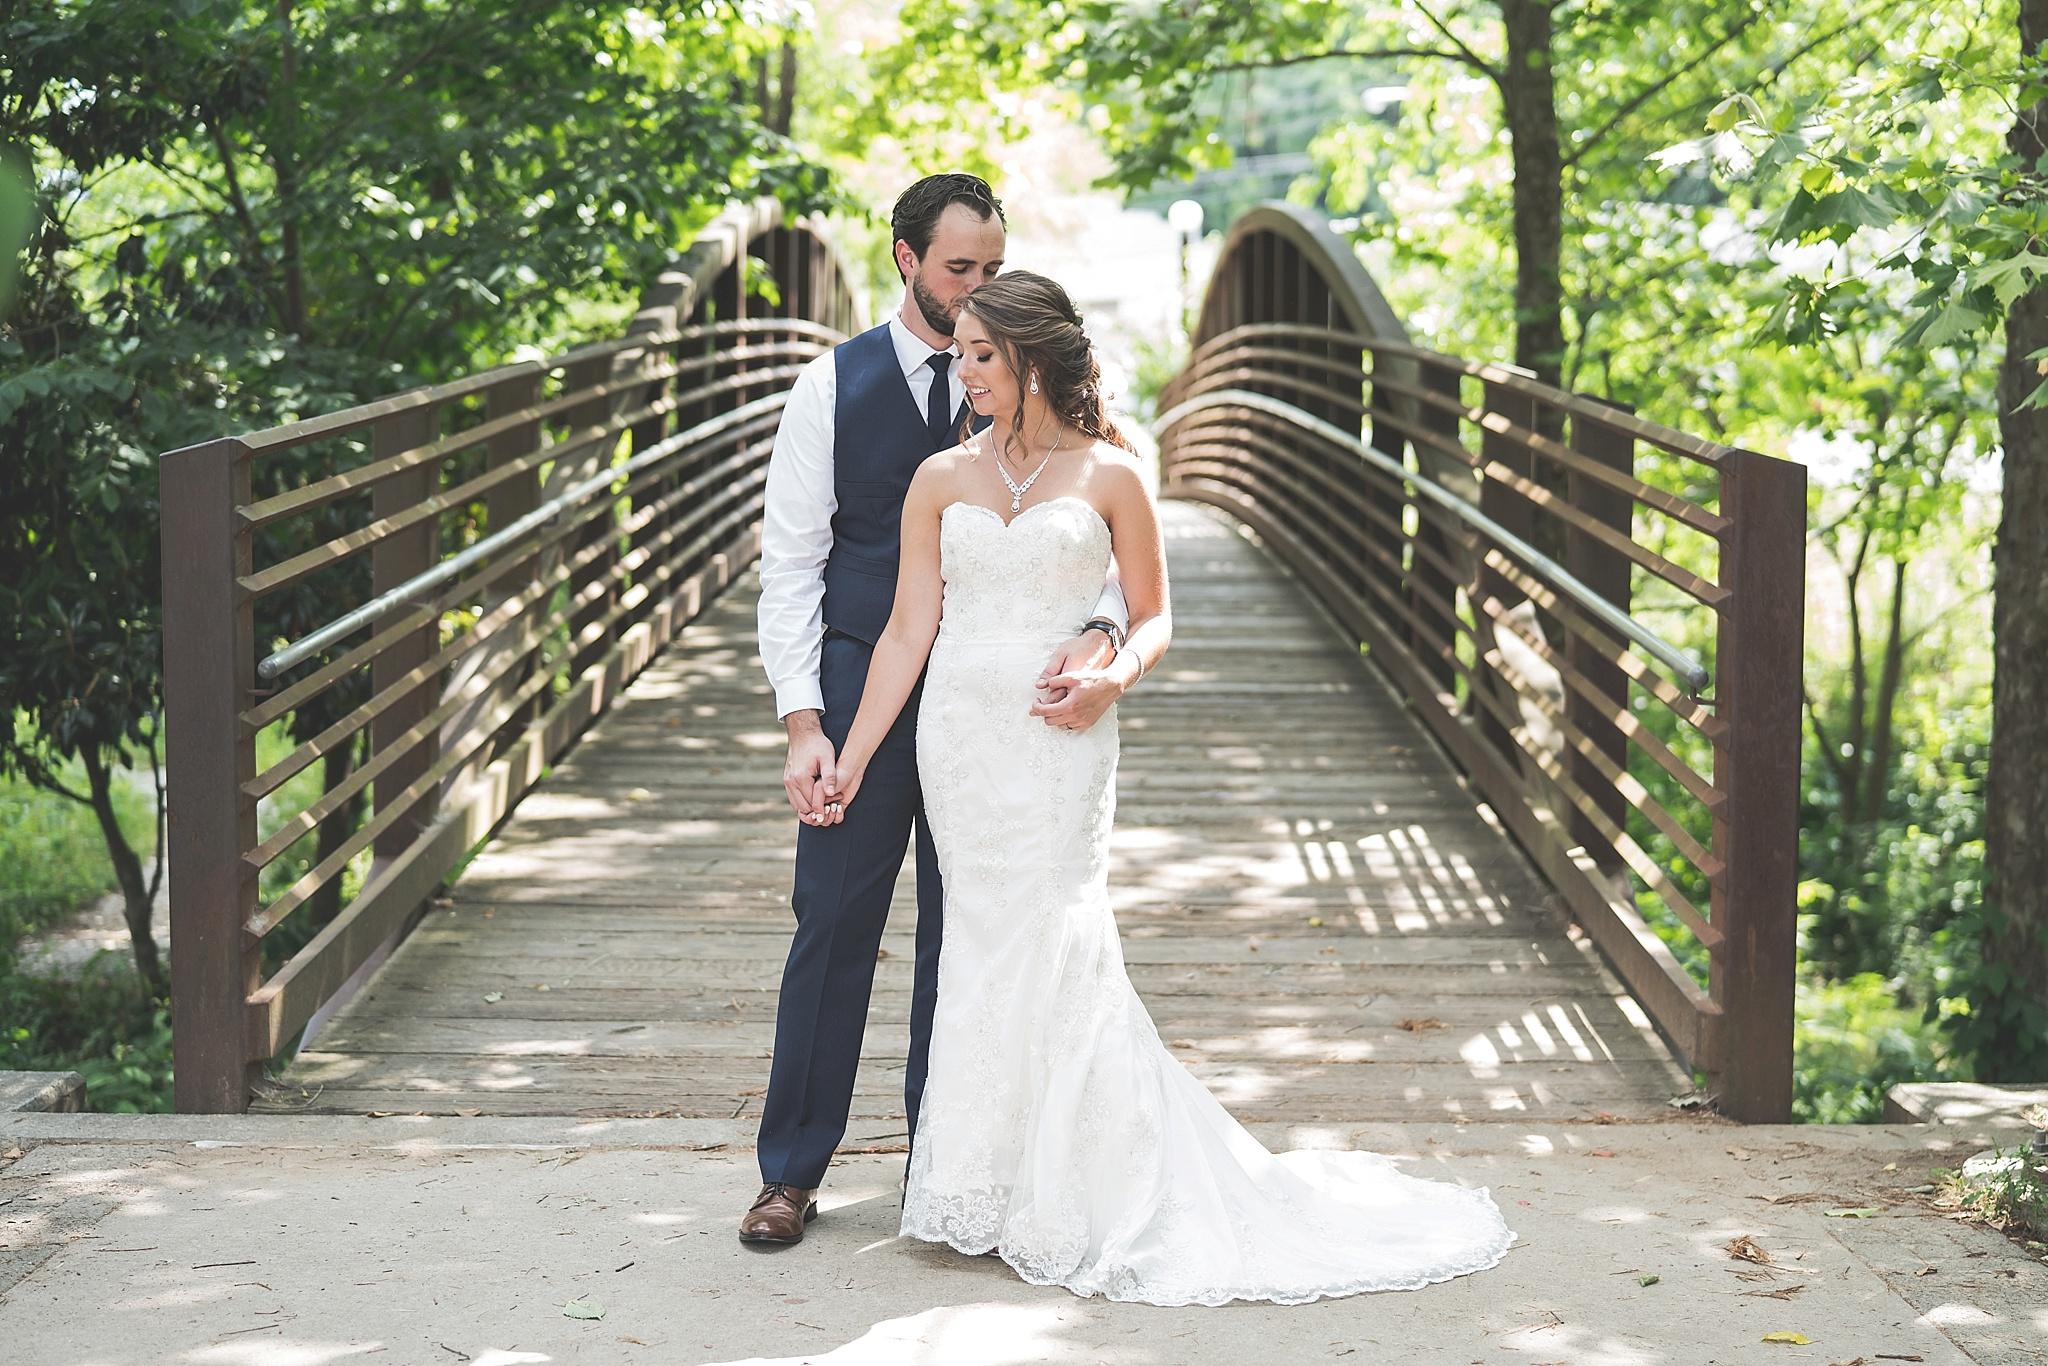 Rickhouse-Durham-NC-Wedding-Photographer-001.jpg